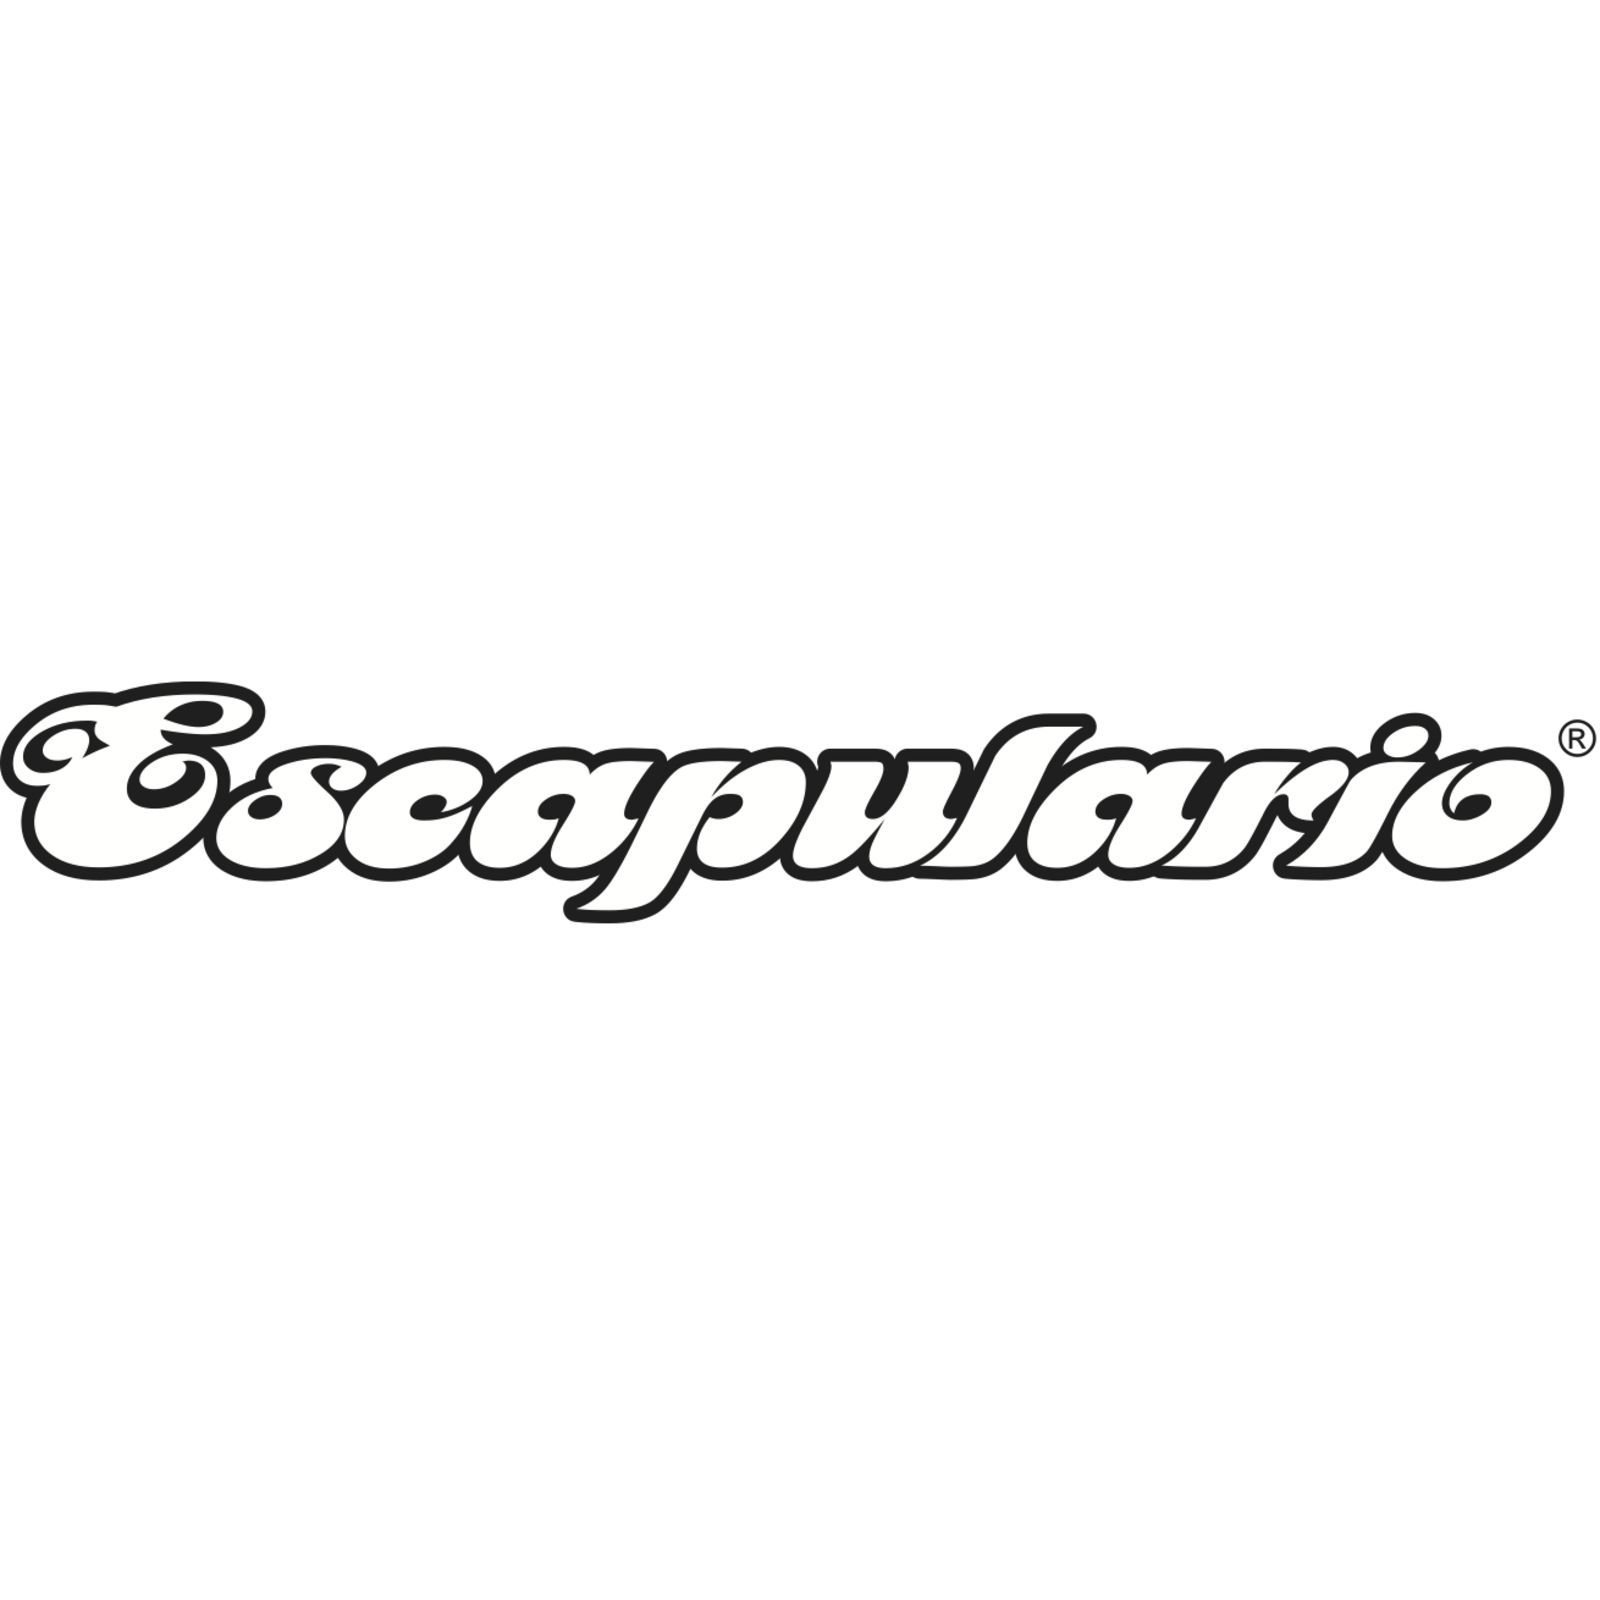 Escapulario®